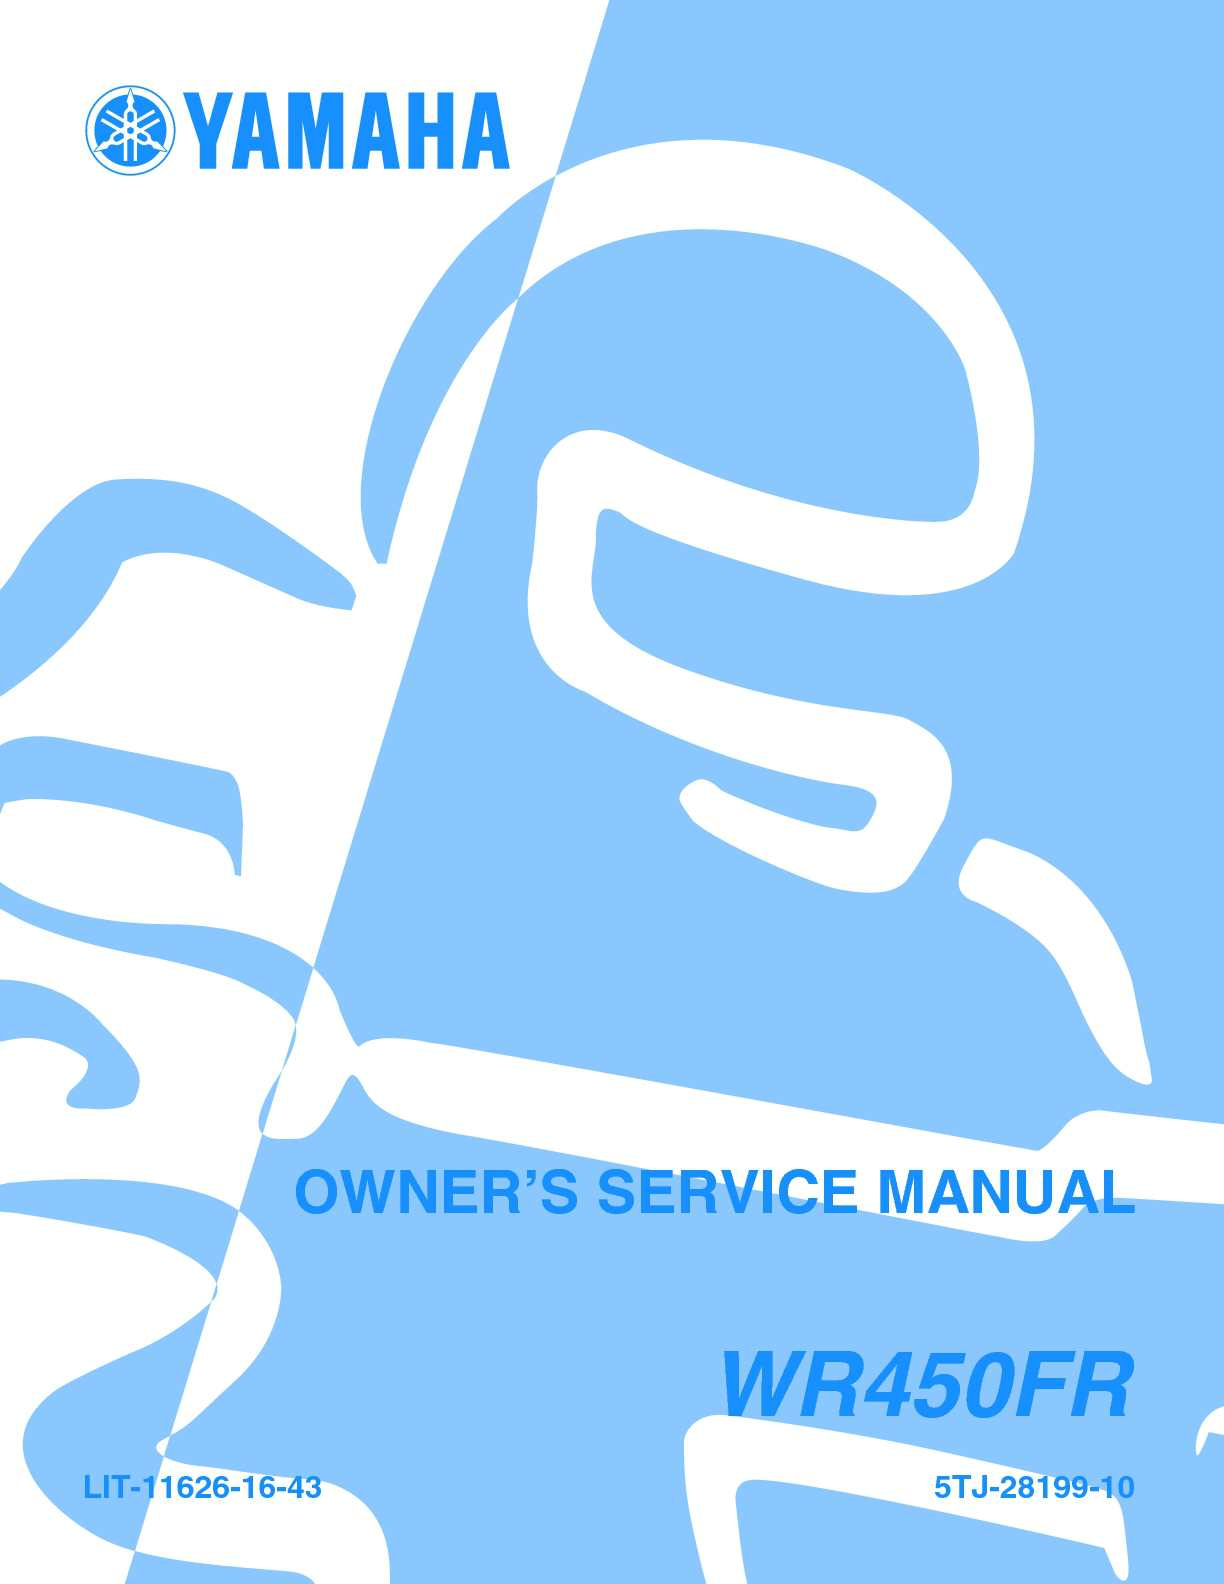 Calamo Manual Taller Yamaha Wr 450 F 2003 Digital Tachometer Wiring Diagram Free Download